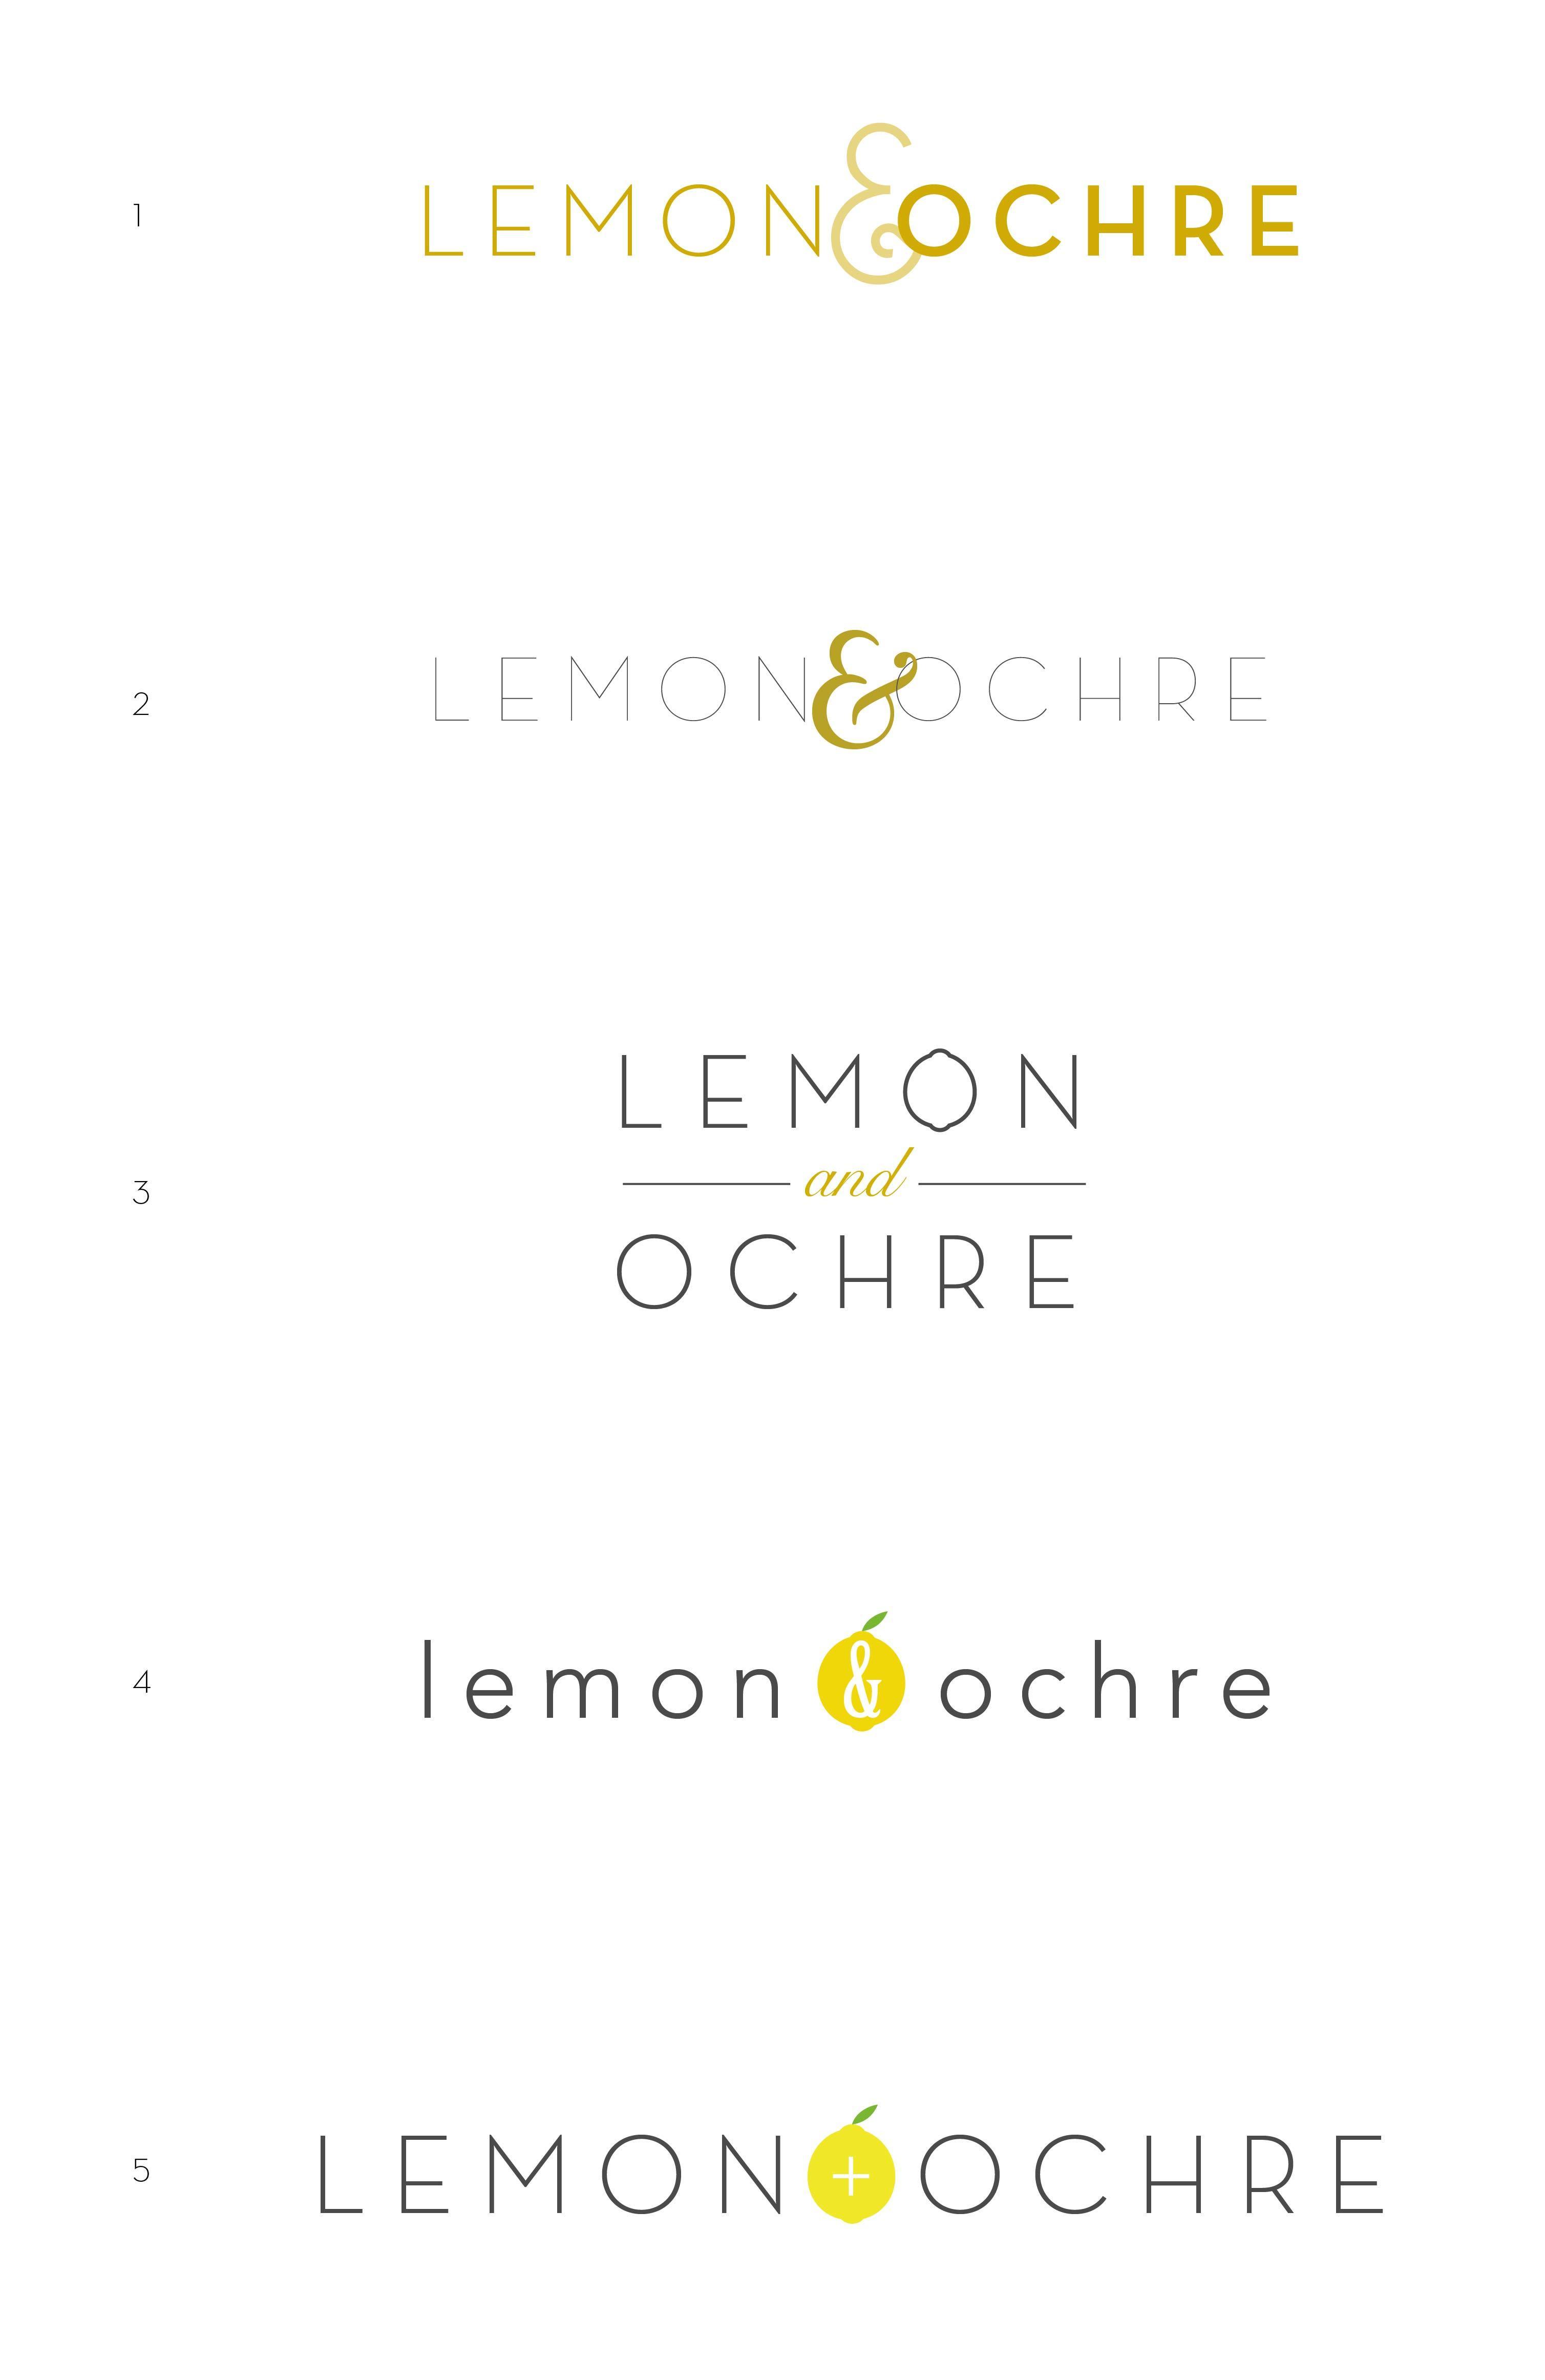 Lemon & Ochre Logo - image 3 - student project